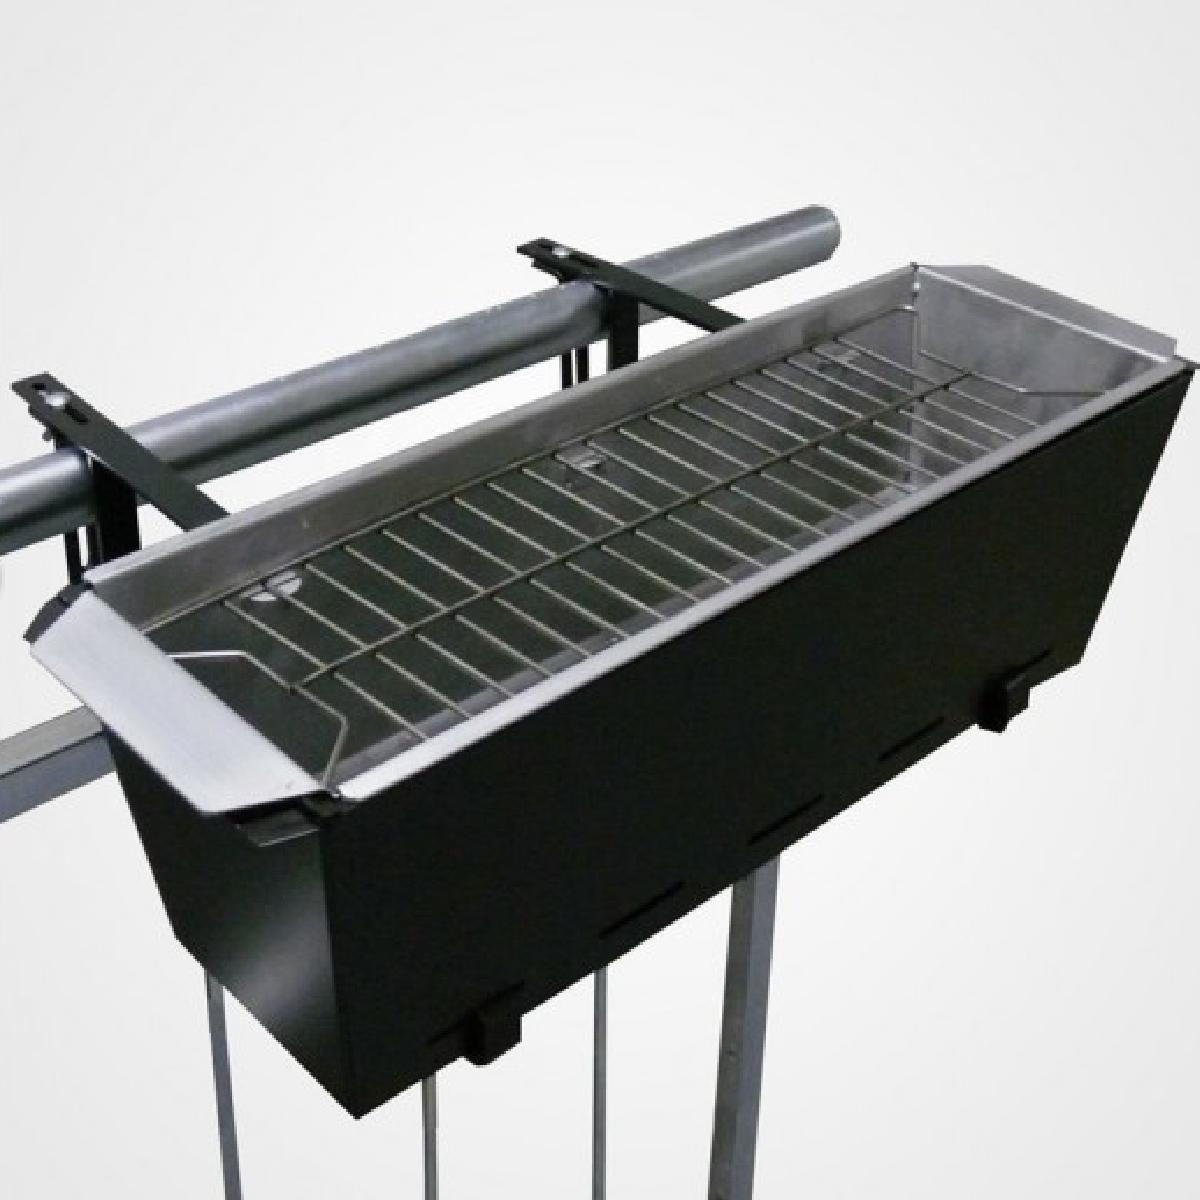 barbecue pour balcon installé sur une rambarde